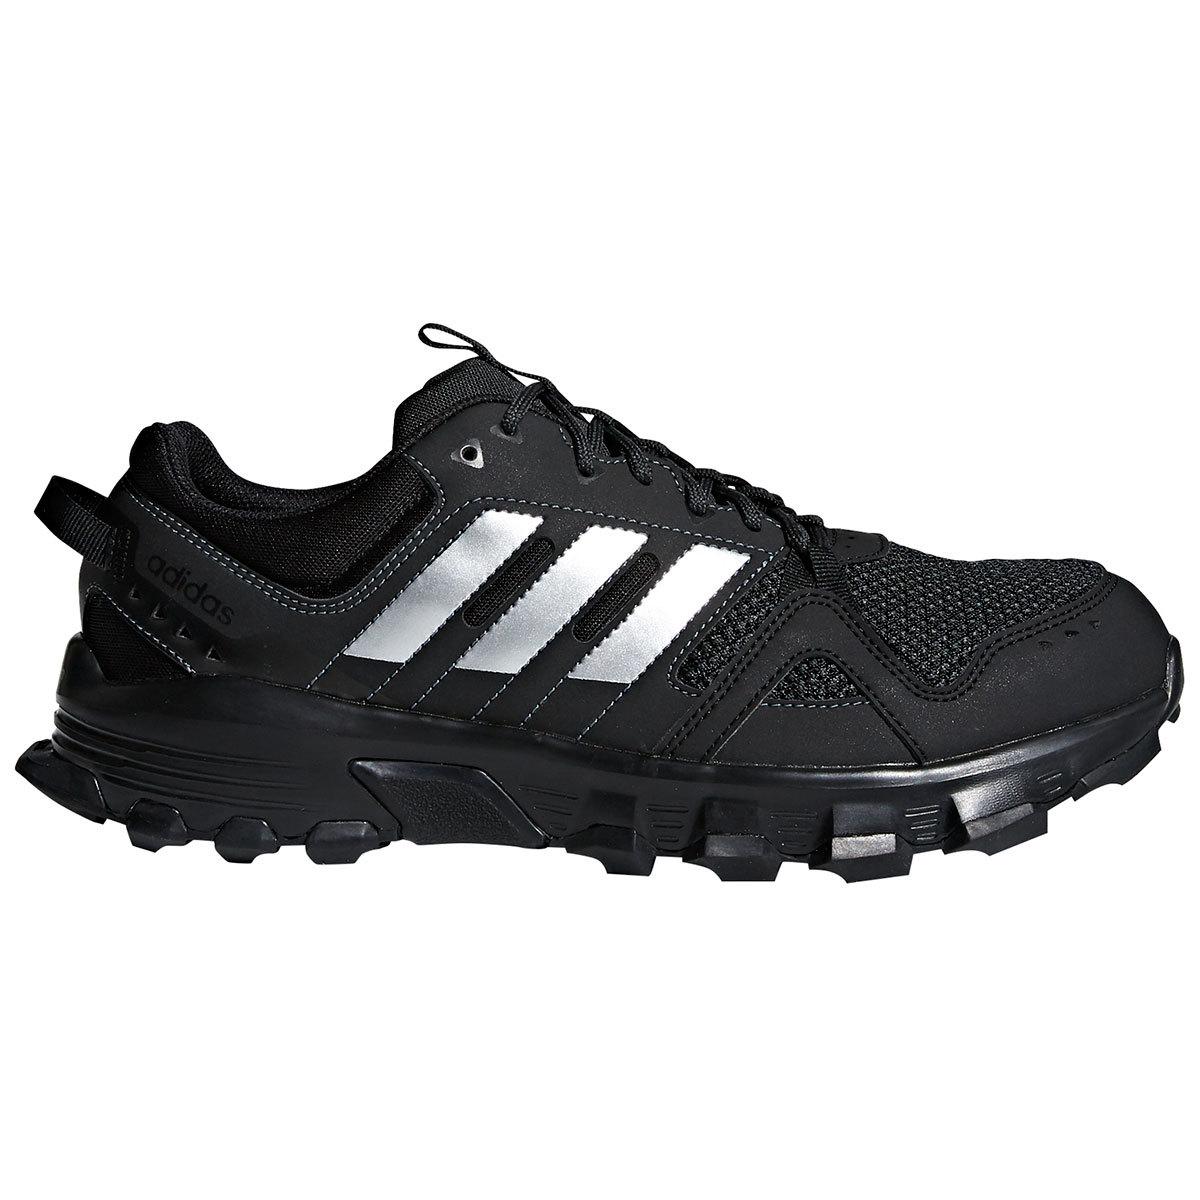 Adidas Men's Rockadia Trail Running Shoes, Wide - Black, 9